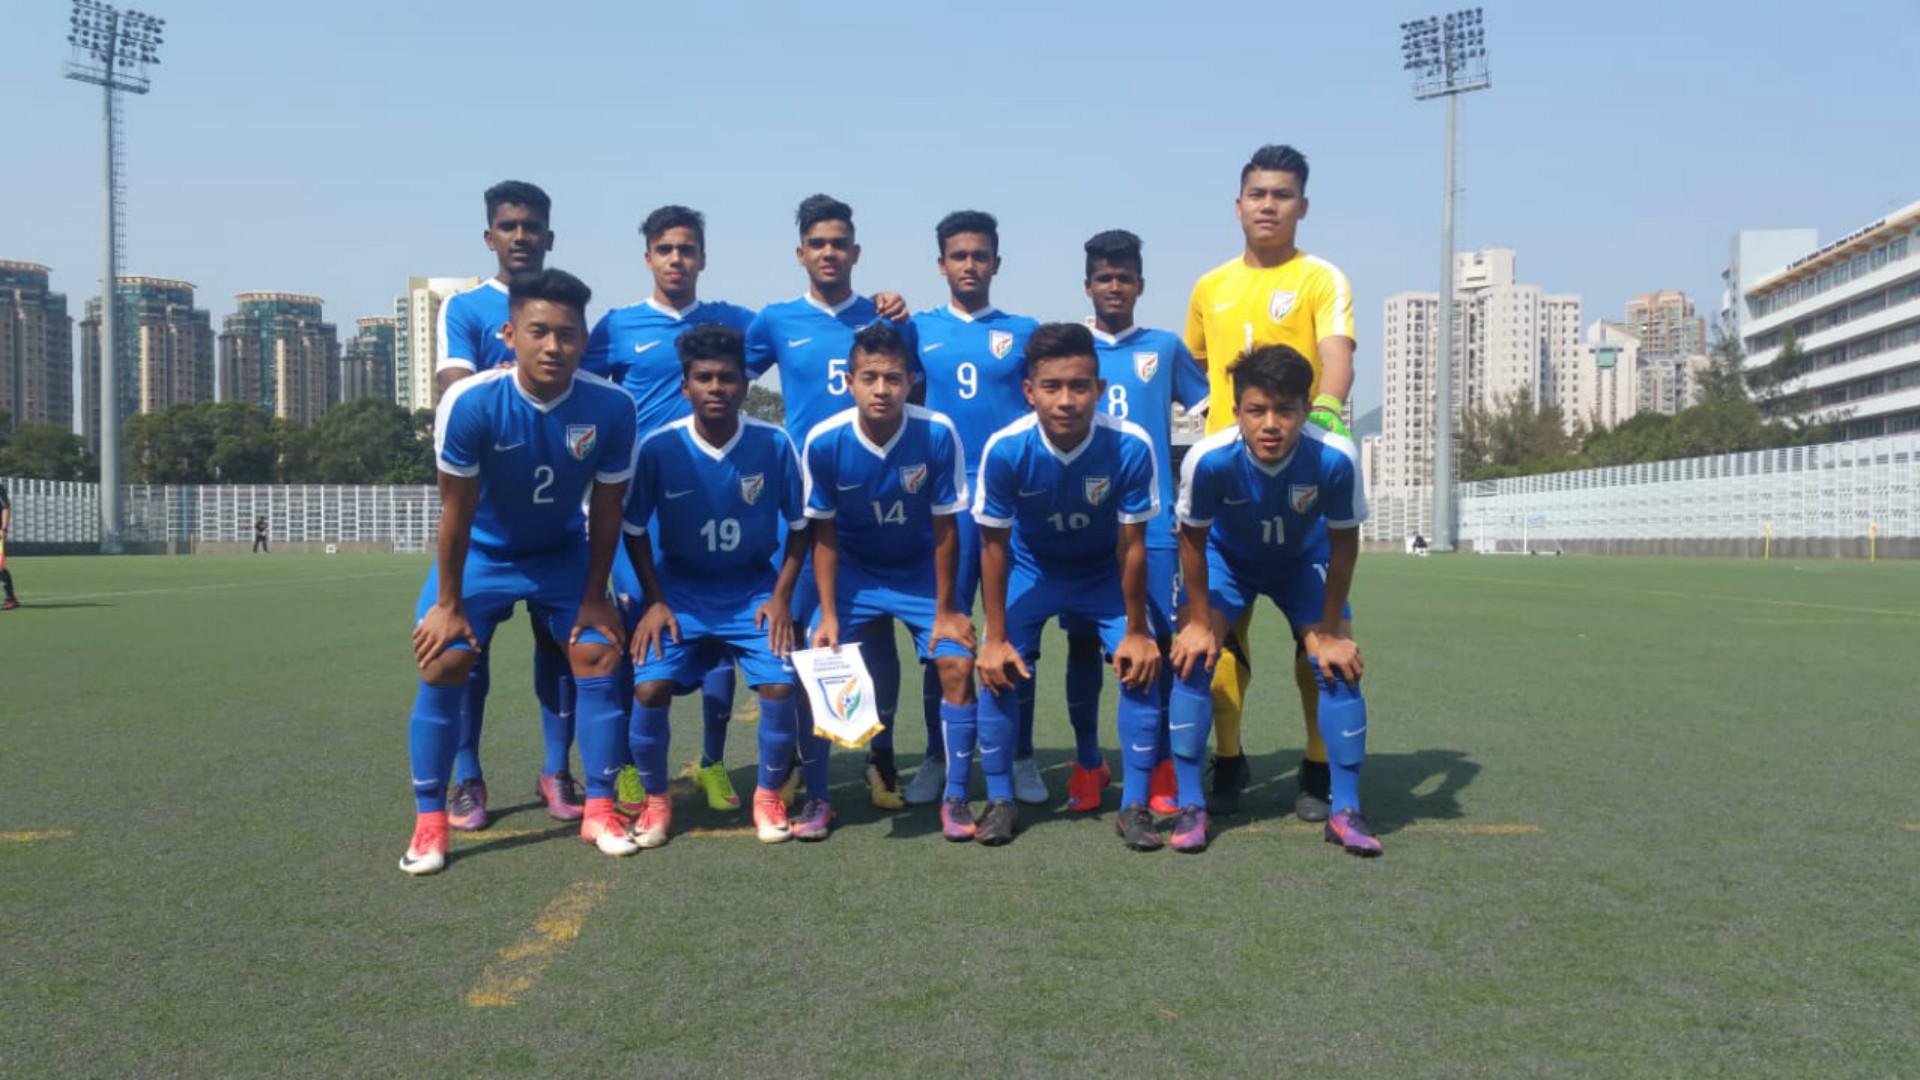 India U16 starting XI v Chinese Taipei in the Scoreboard at the Jockey Club International Youth Invitational Football Tournament